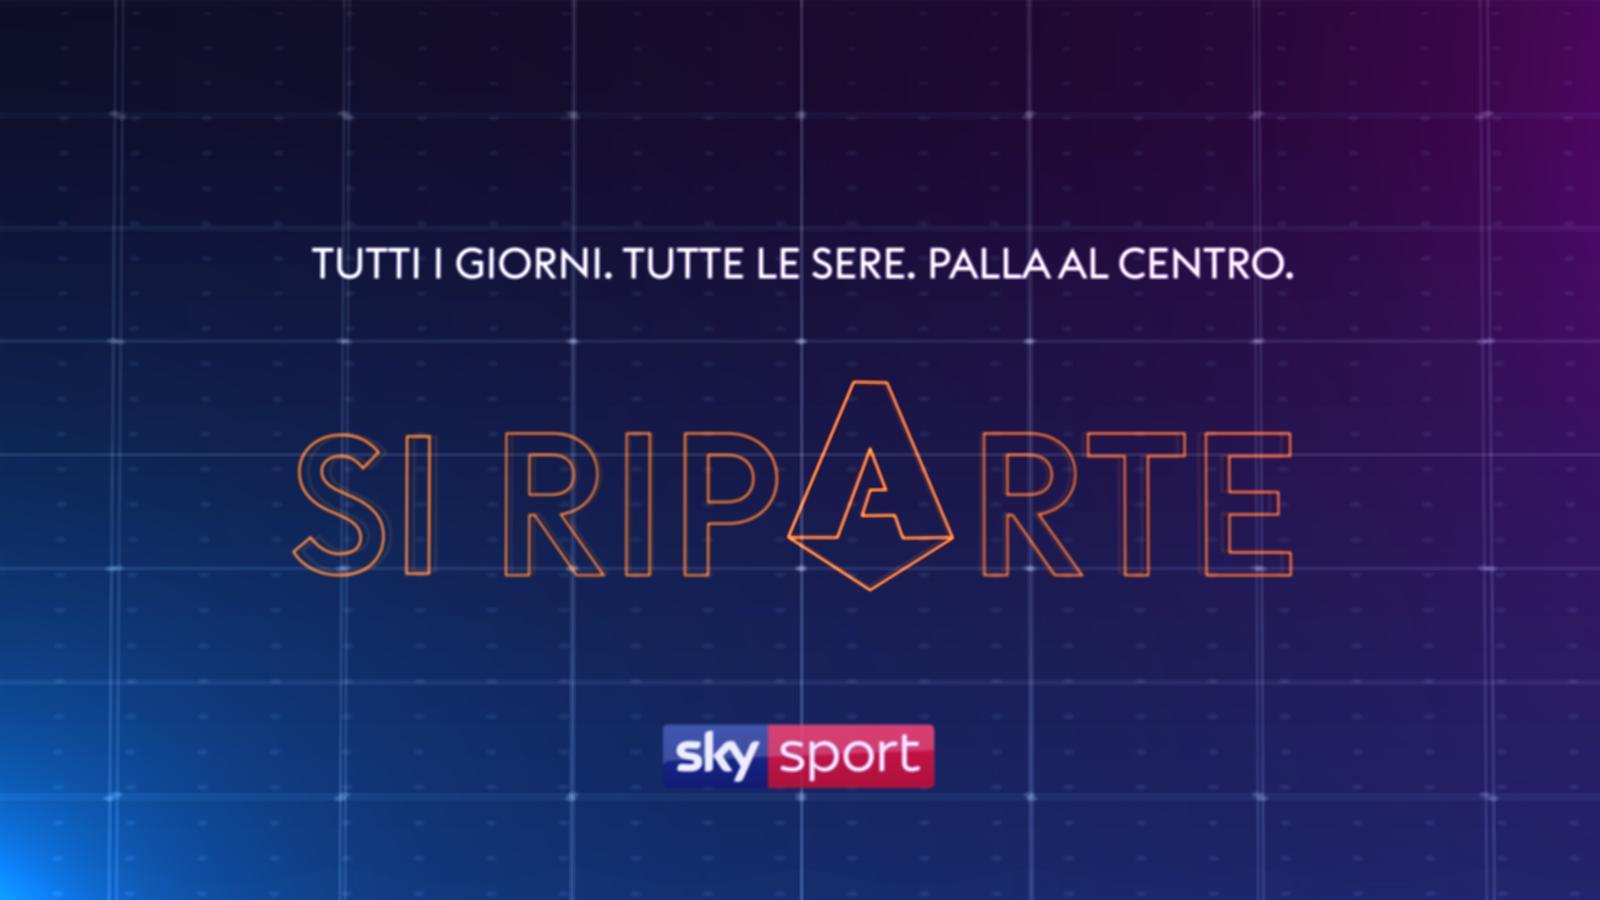 Sky Sport, Serie A 32 Giornata, Diretta Esclusiva, Palinsest